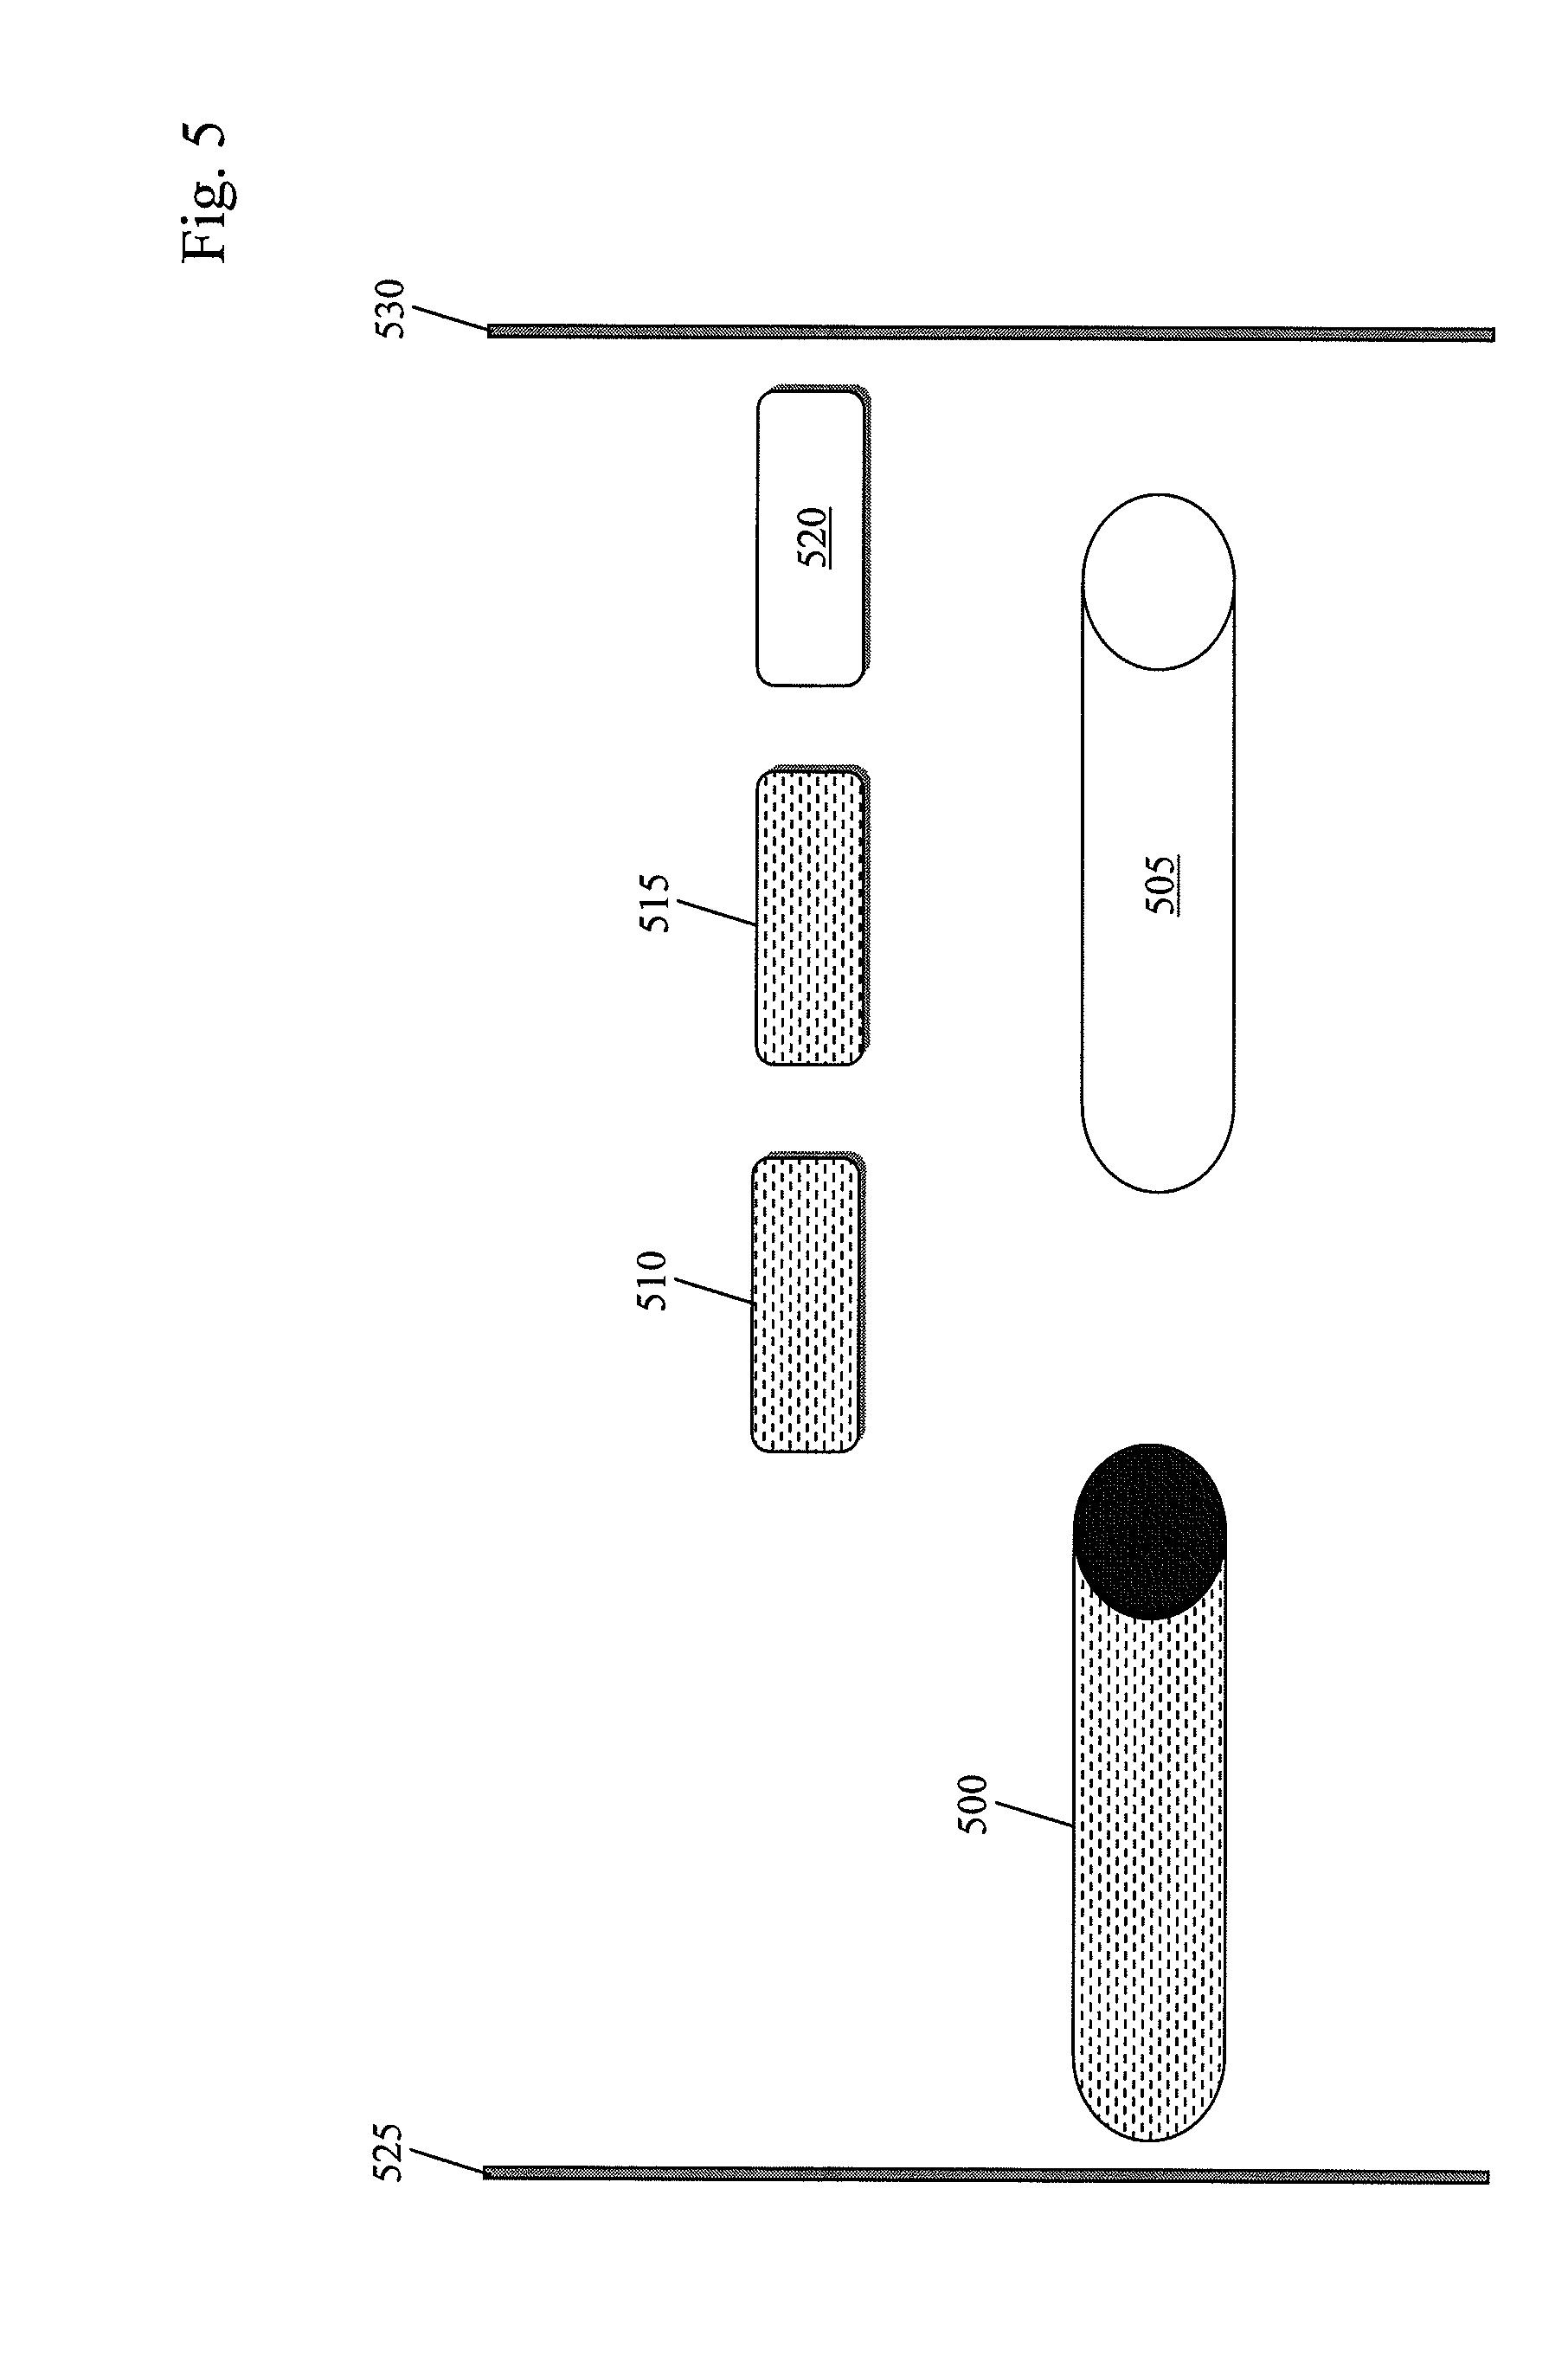 Patent US 8,449,360 B2